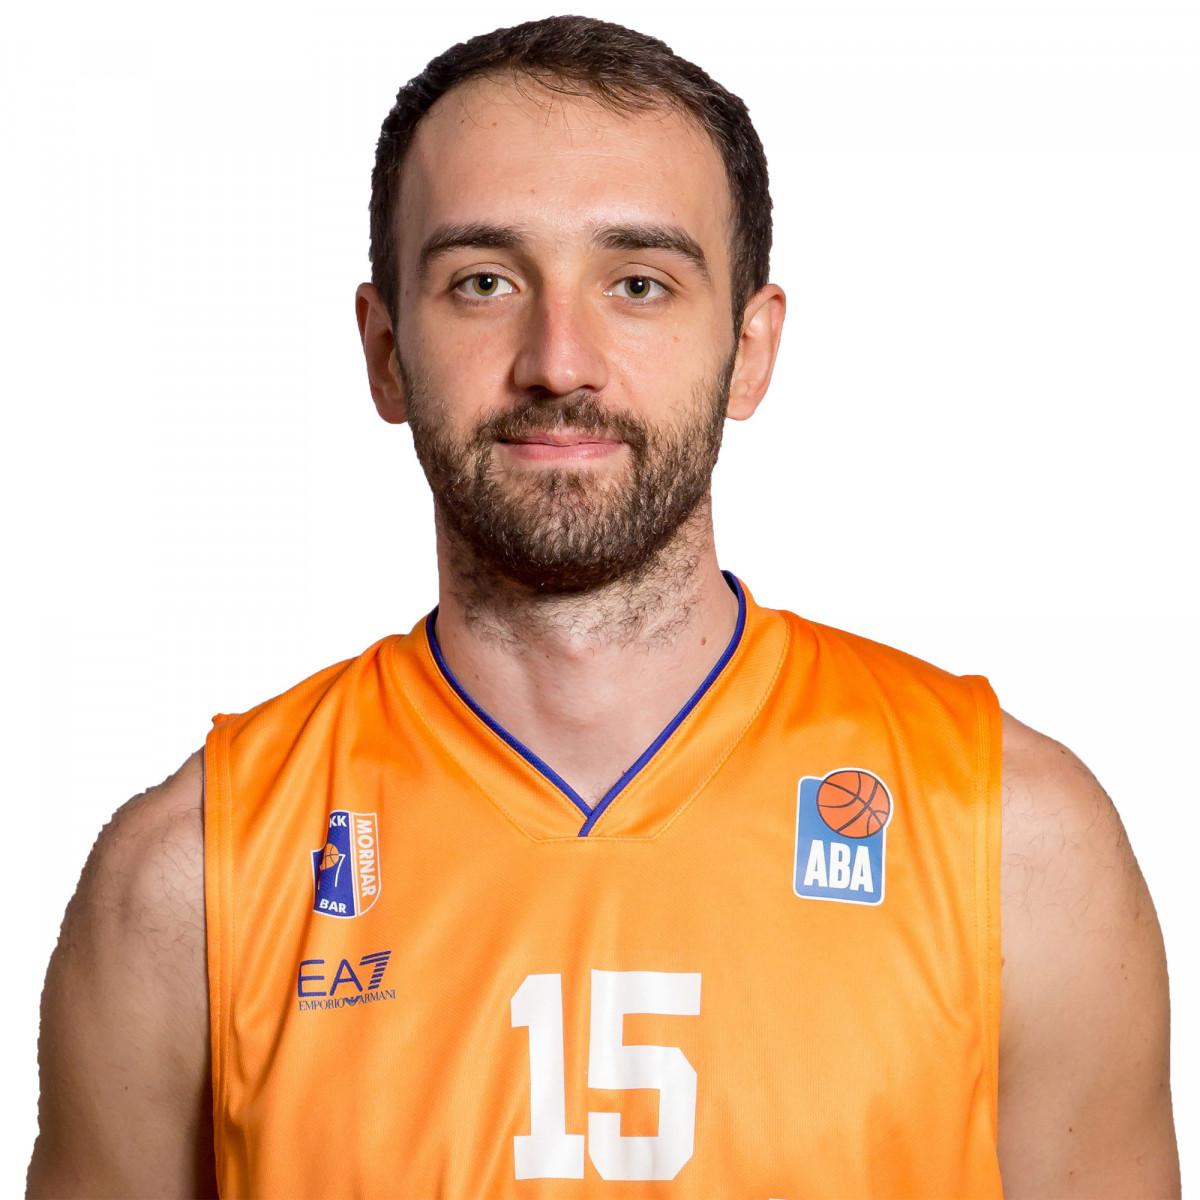 Photo of Mirza Begic, 2019-2020 season